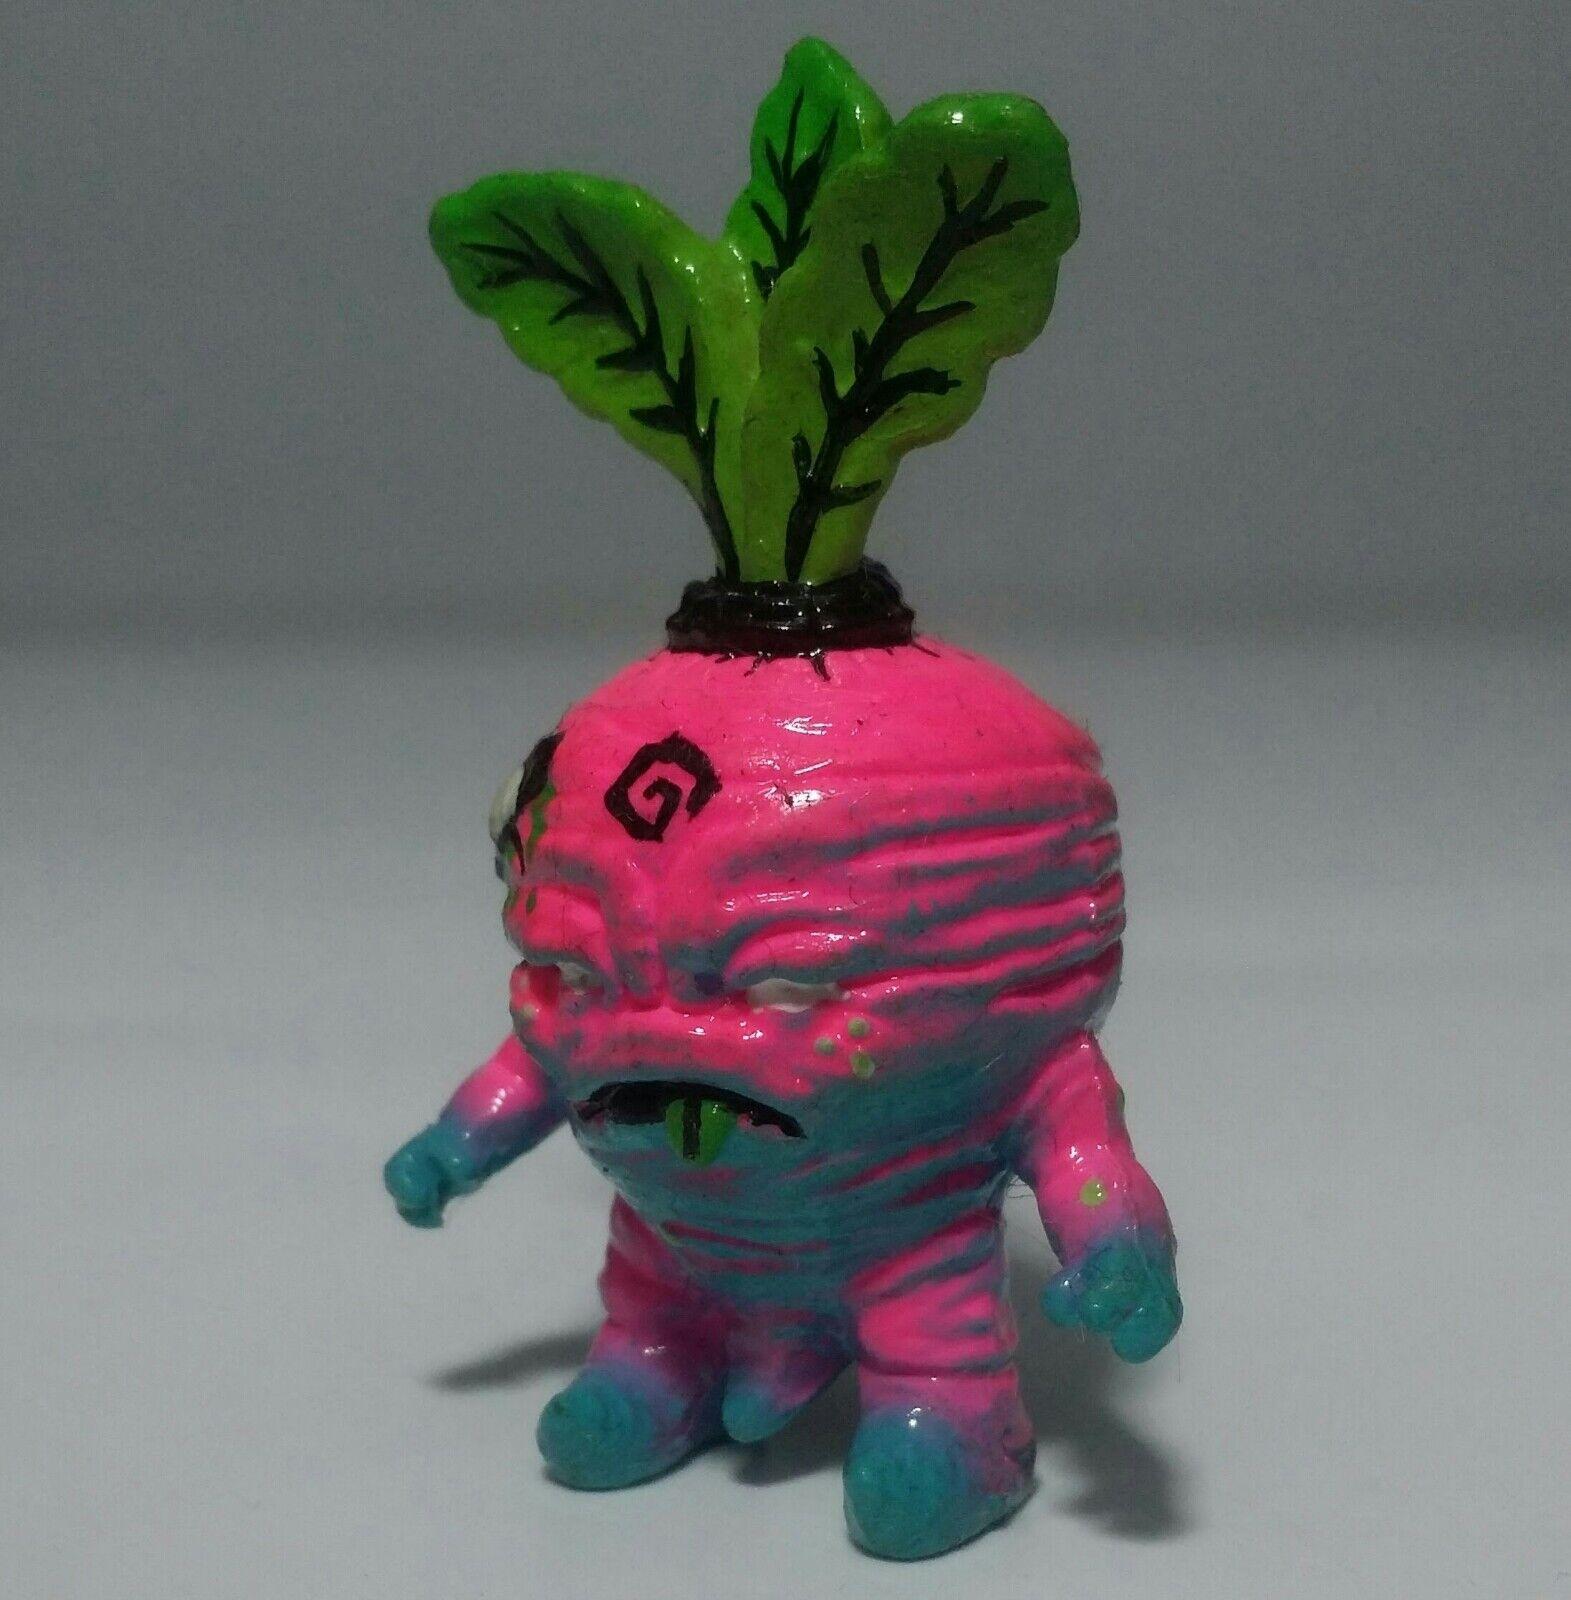 Ardabus Rubber - Deadbeet 1.5  by Scott Scott Scott Tolleson LE 20 Kidrobot 031723